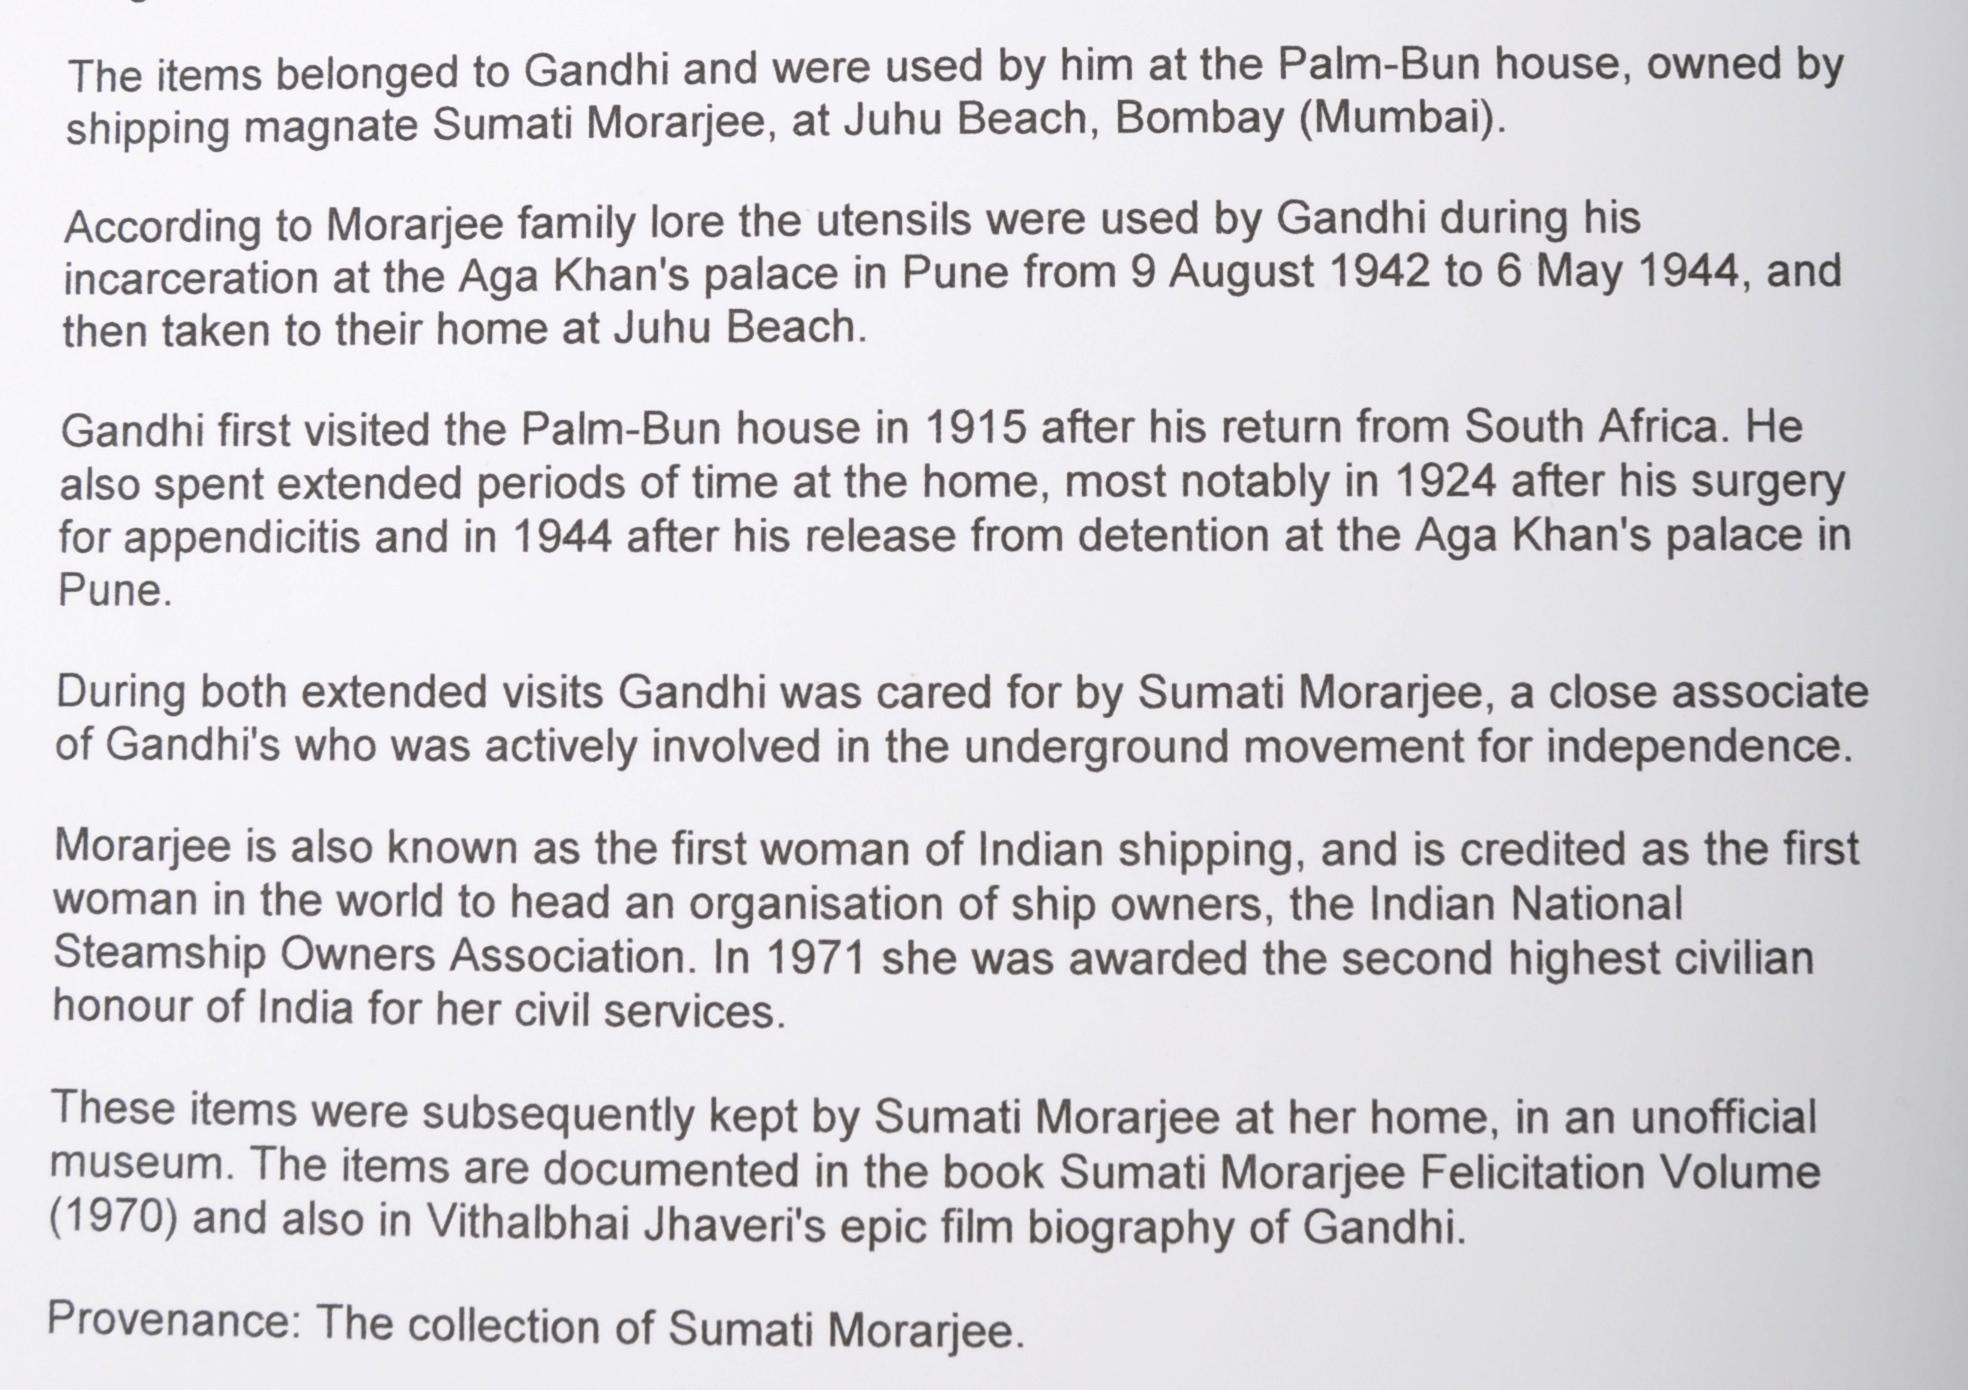 MAHATMA GANDHI - GANDHI'S PERSONALLY USED CUTLERY & BOWL - Image 8 of 9